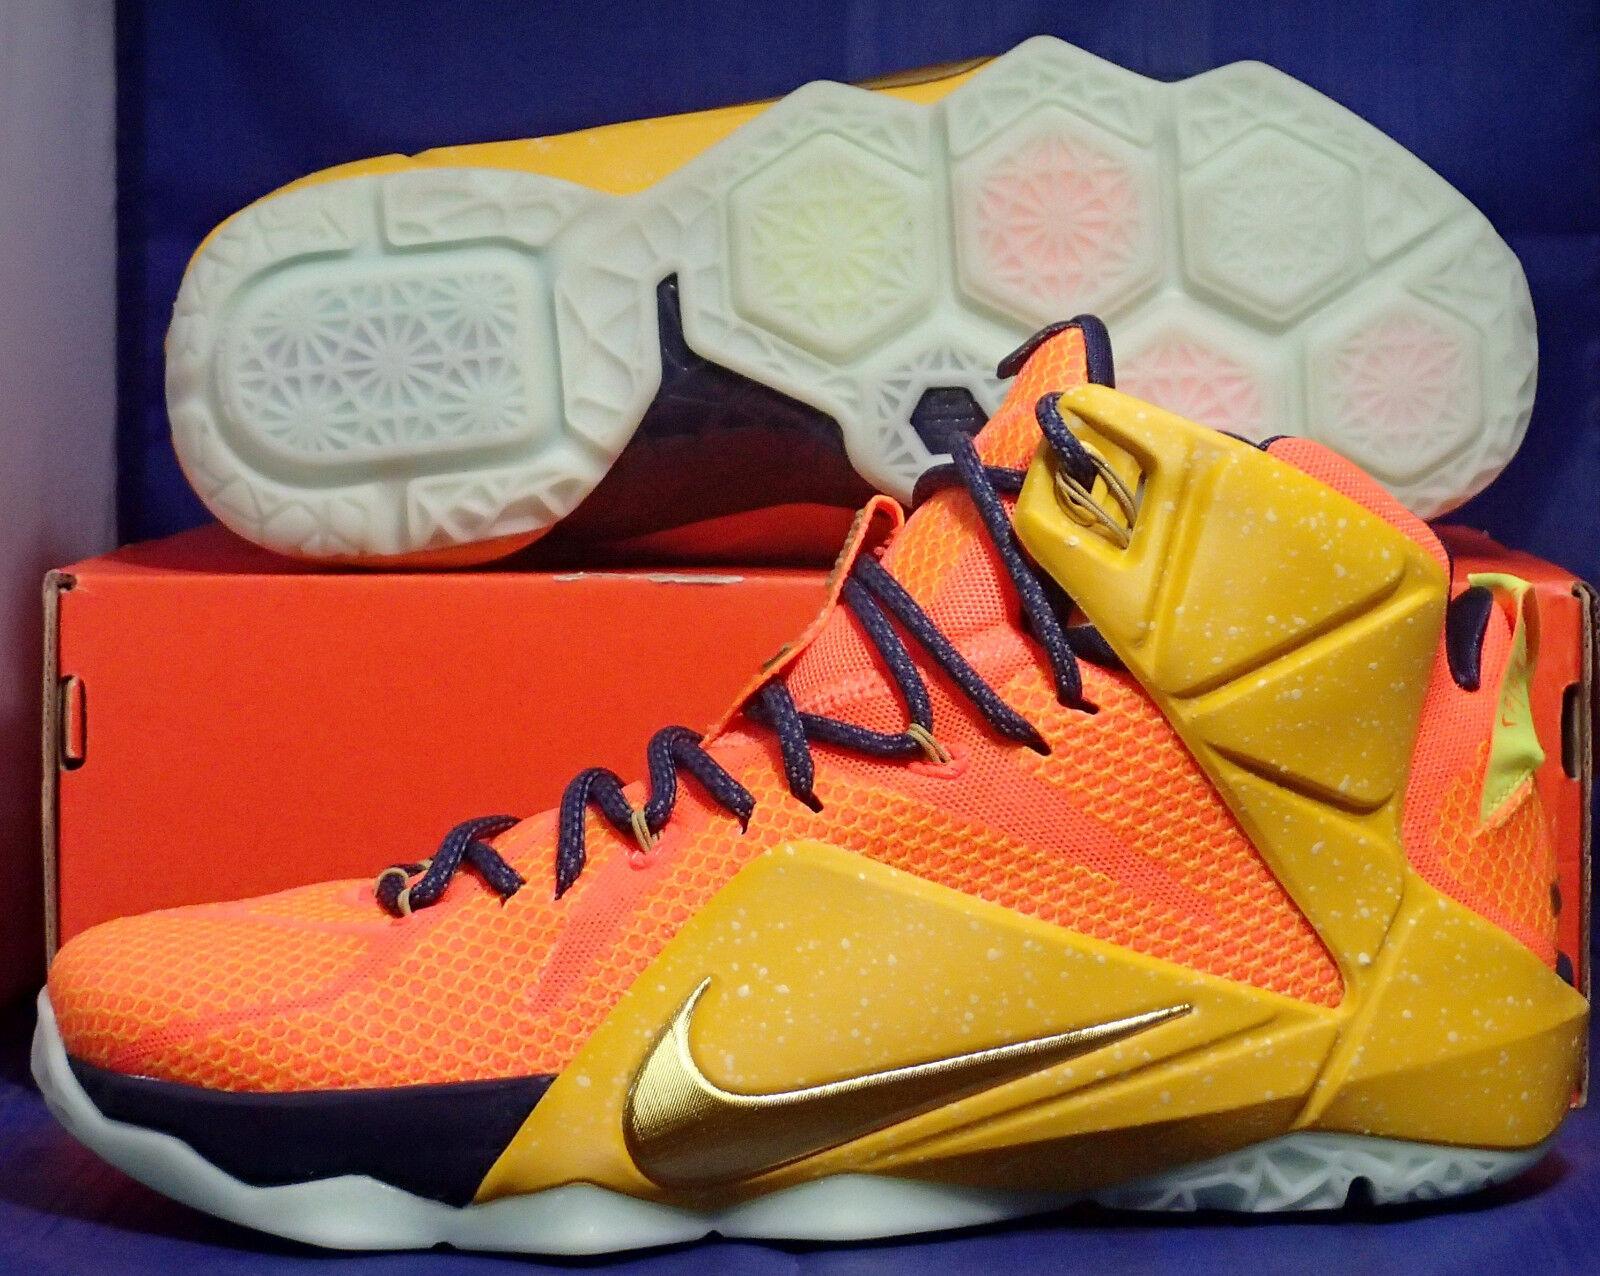 Nike Lebron XII 12 iD Orange Yellow Navy Glow in the Dark SZ 9.5 ( 728709-991 )